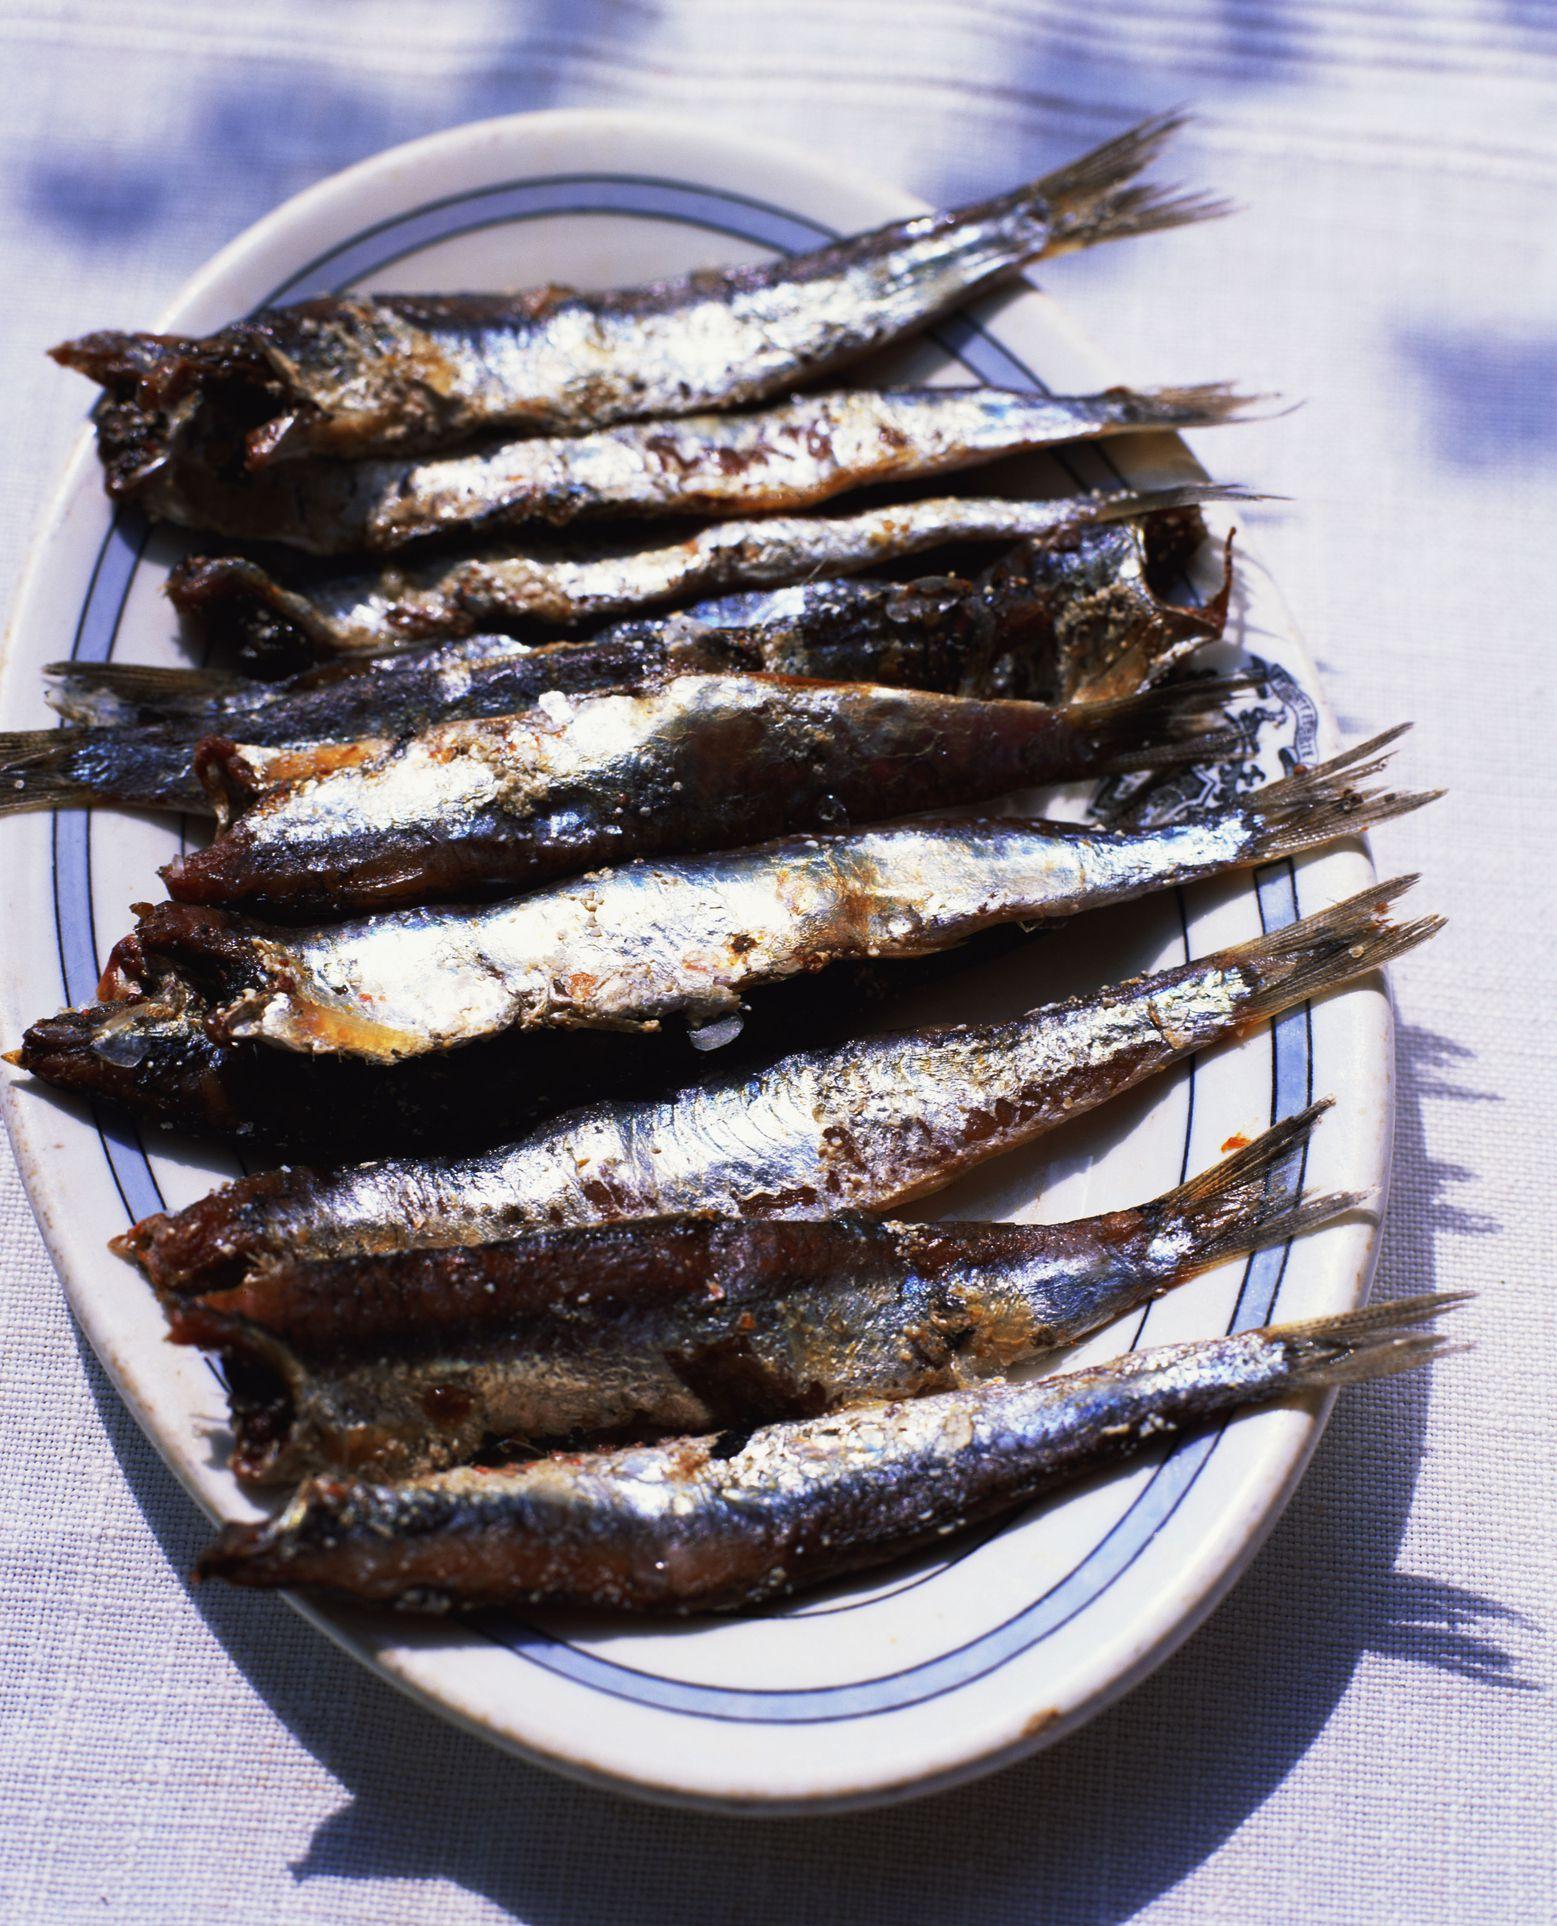 Method And Recipe For Making Smoked Sardines